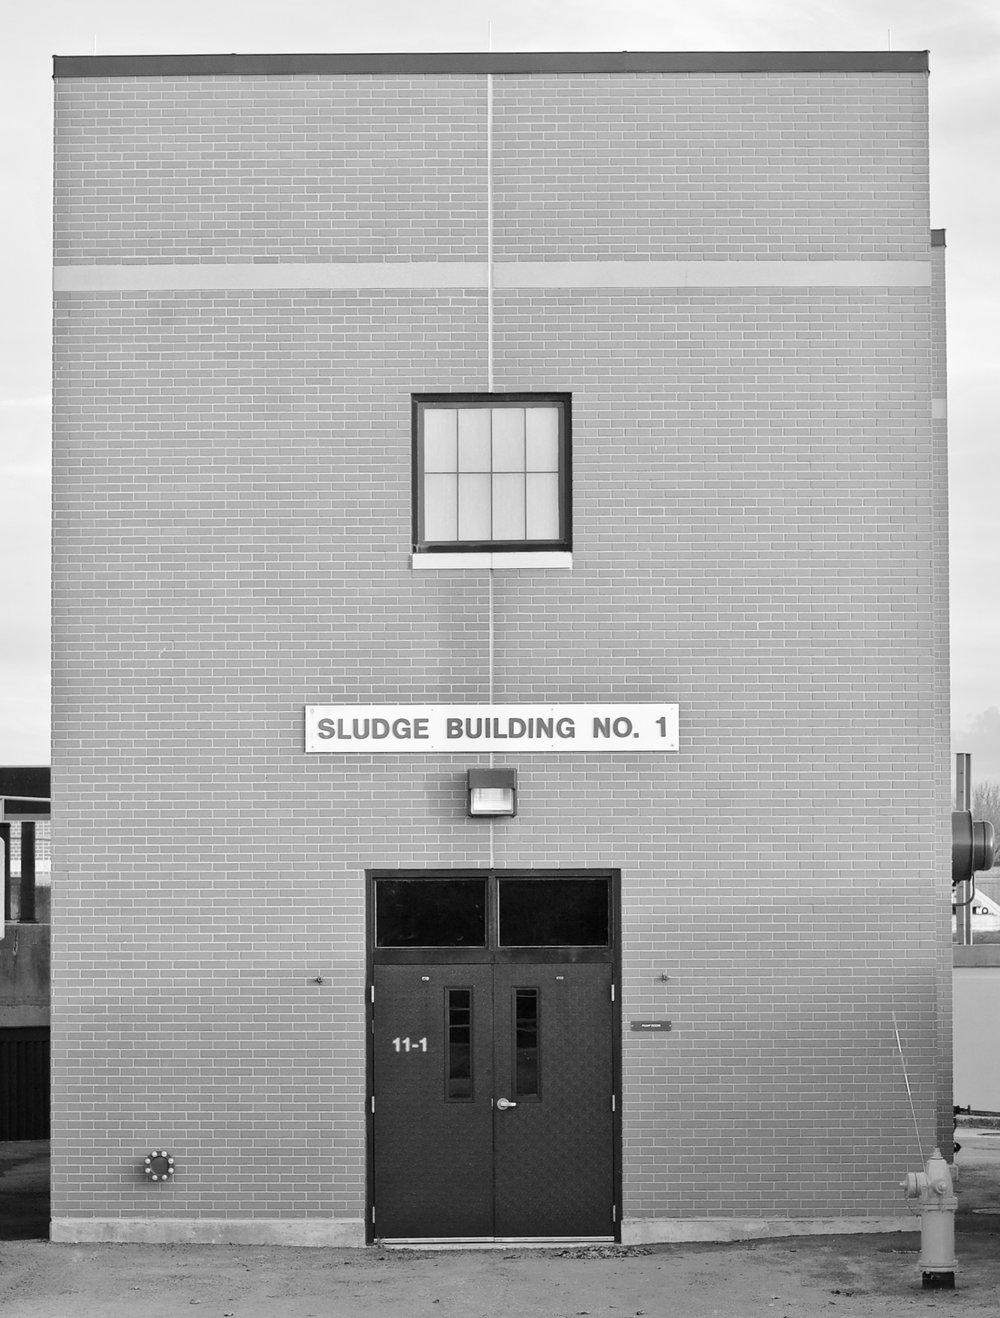 Sludge Building No. 1. MMSD. Madison, Wisconsin. November 2016. © William D. Walker